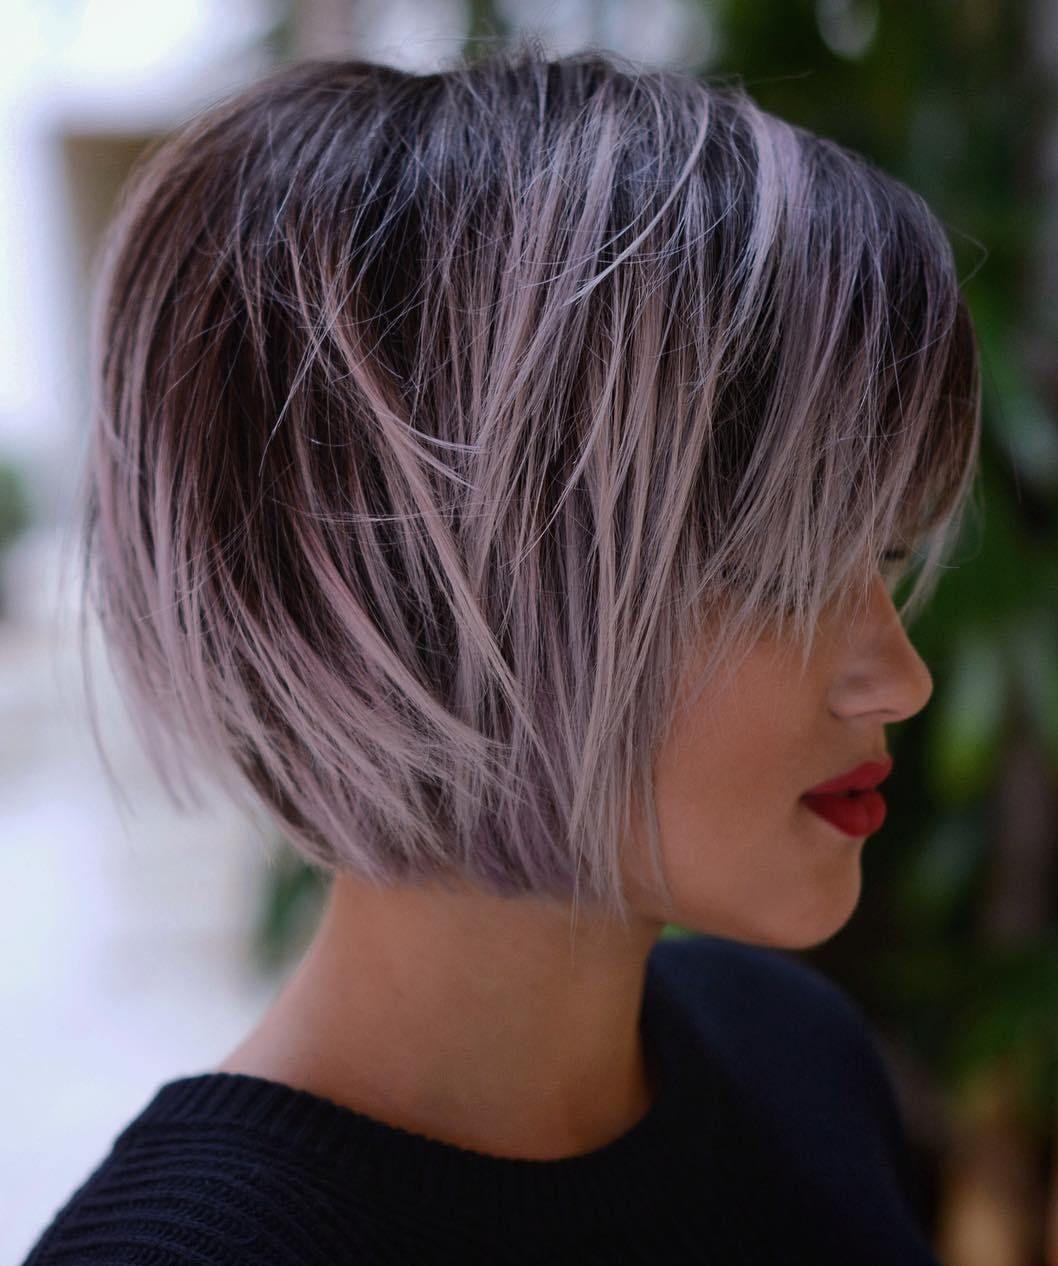 70 Overwhelming Ideas For Short Choppy Haircuts Short Thin Hair Hair Styles Short Choppy Haircuts